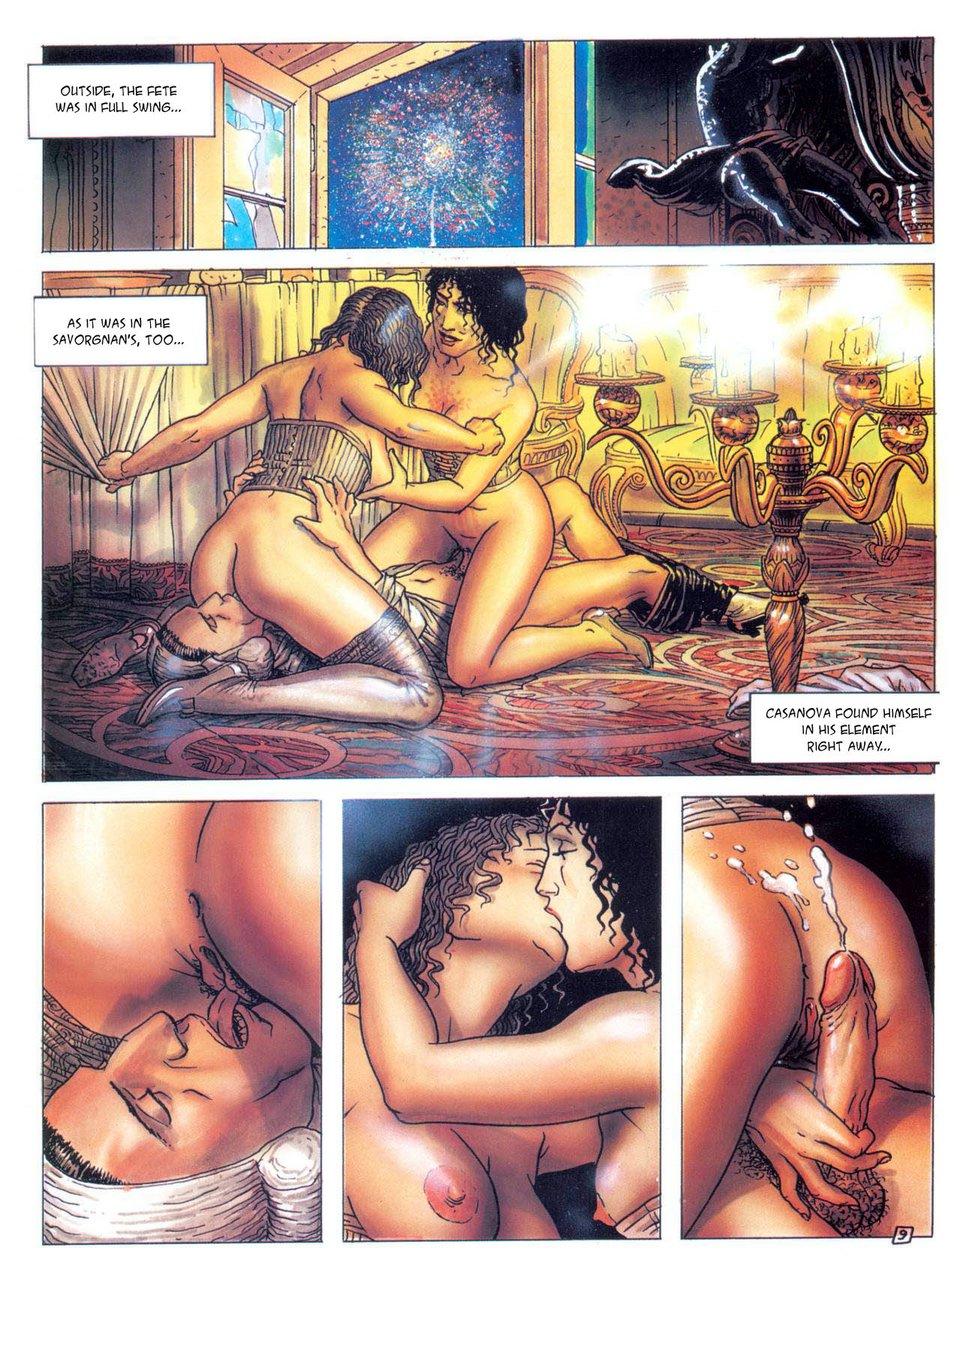 Medieval erotica movie sex exploited pictures